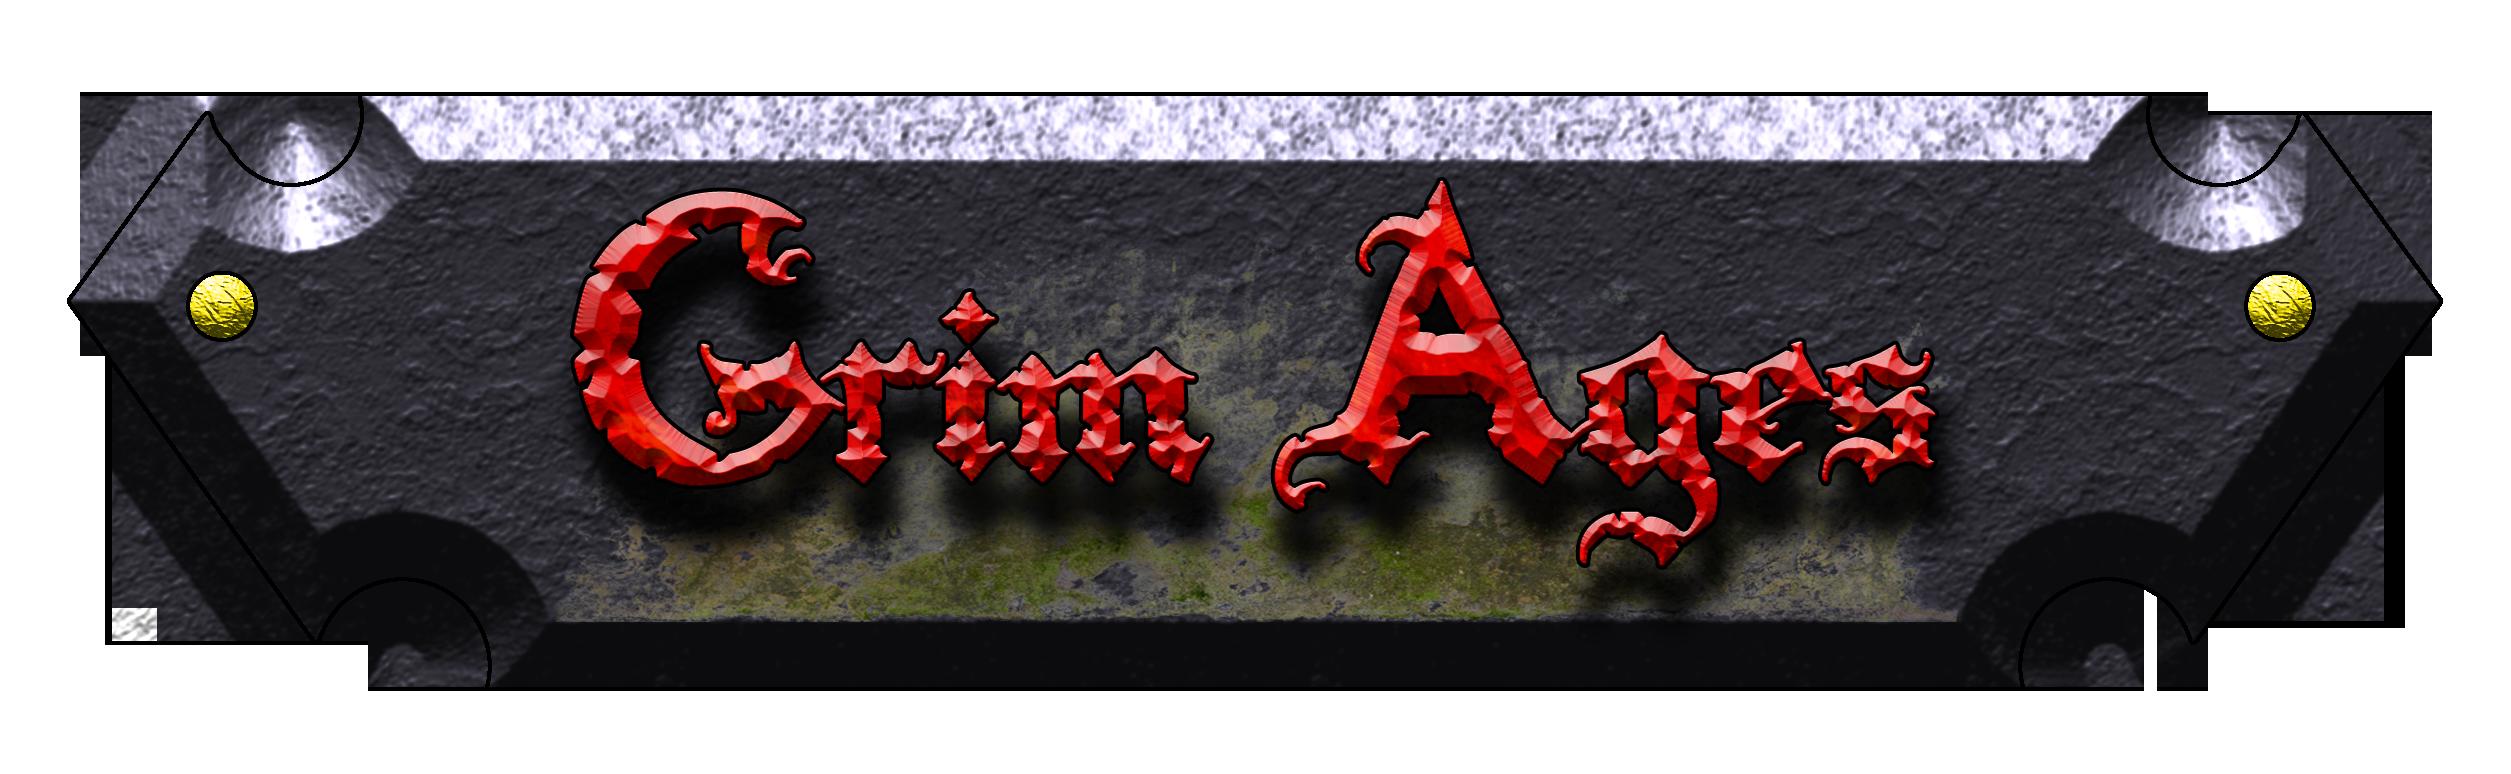 Grim Ages